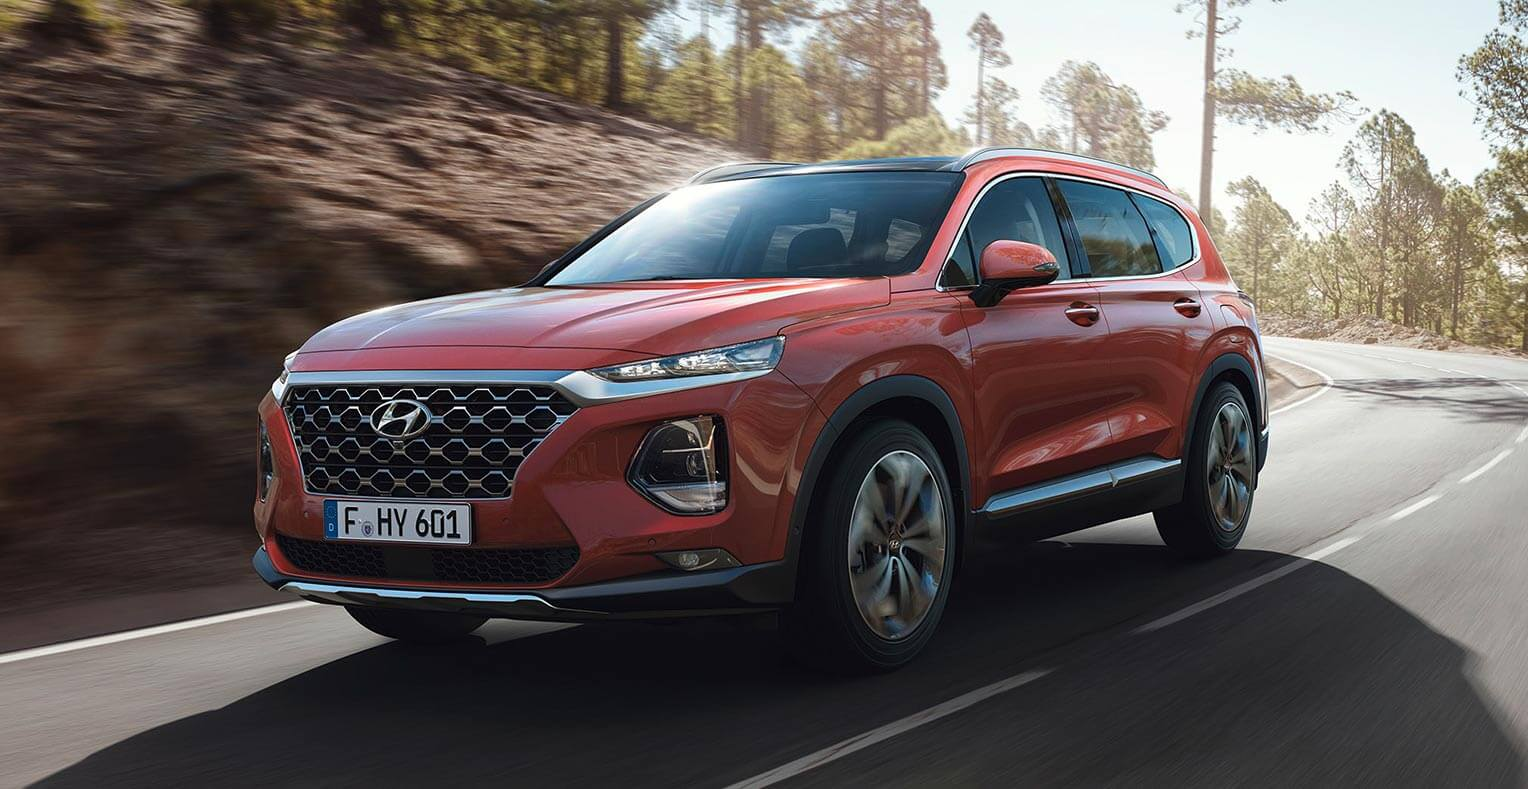 Hyundai Santa Fe 2018 frontal